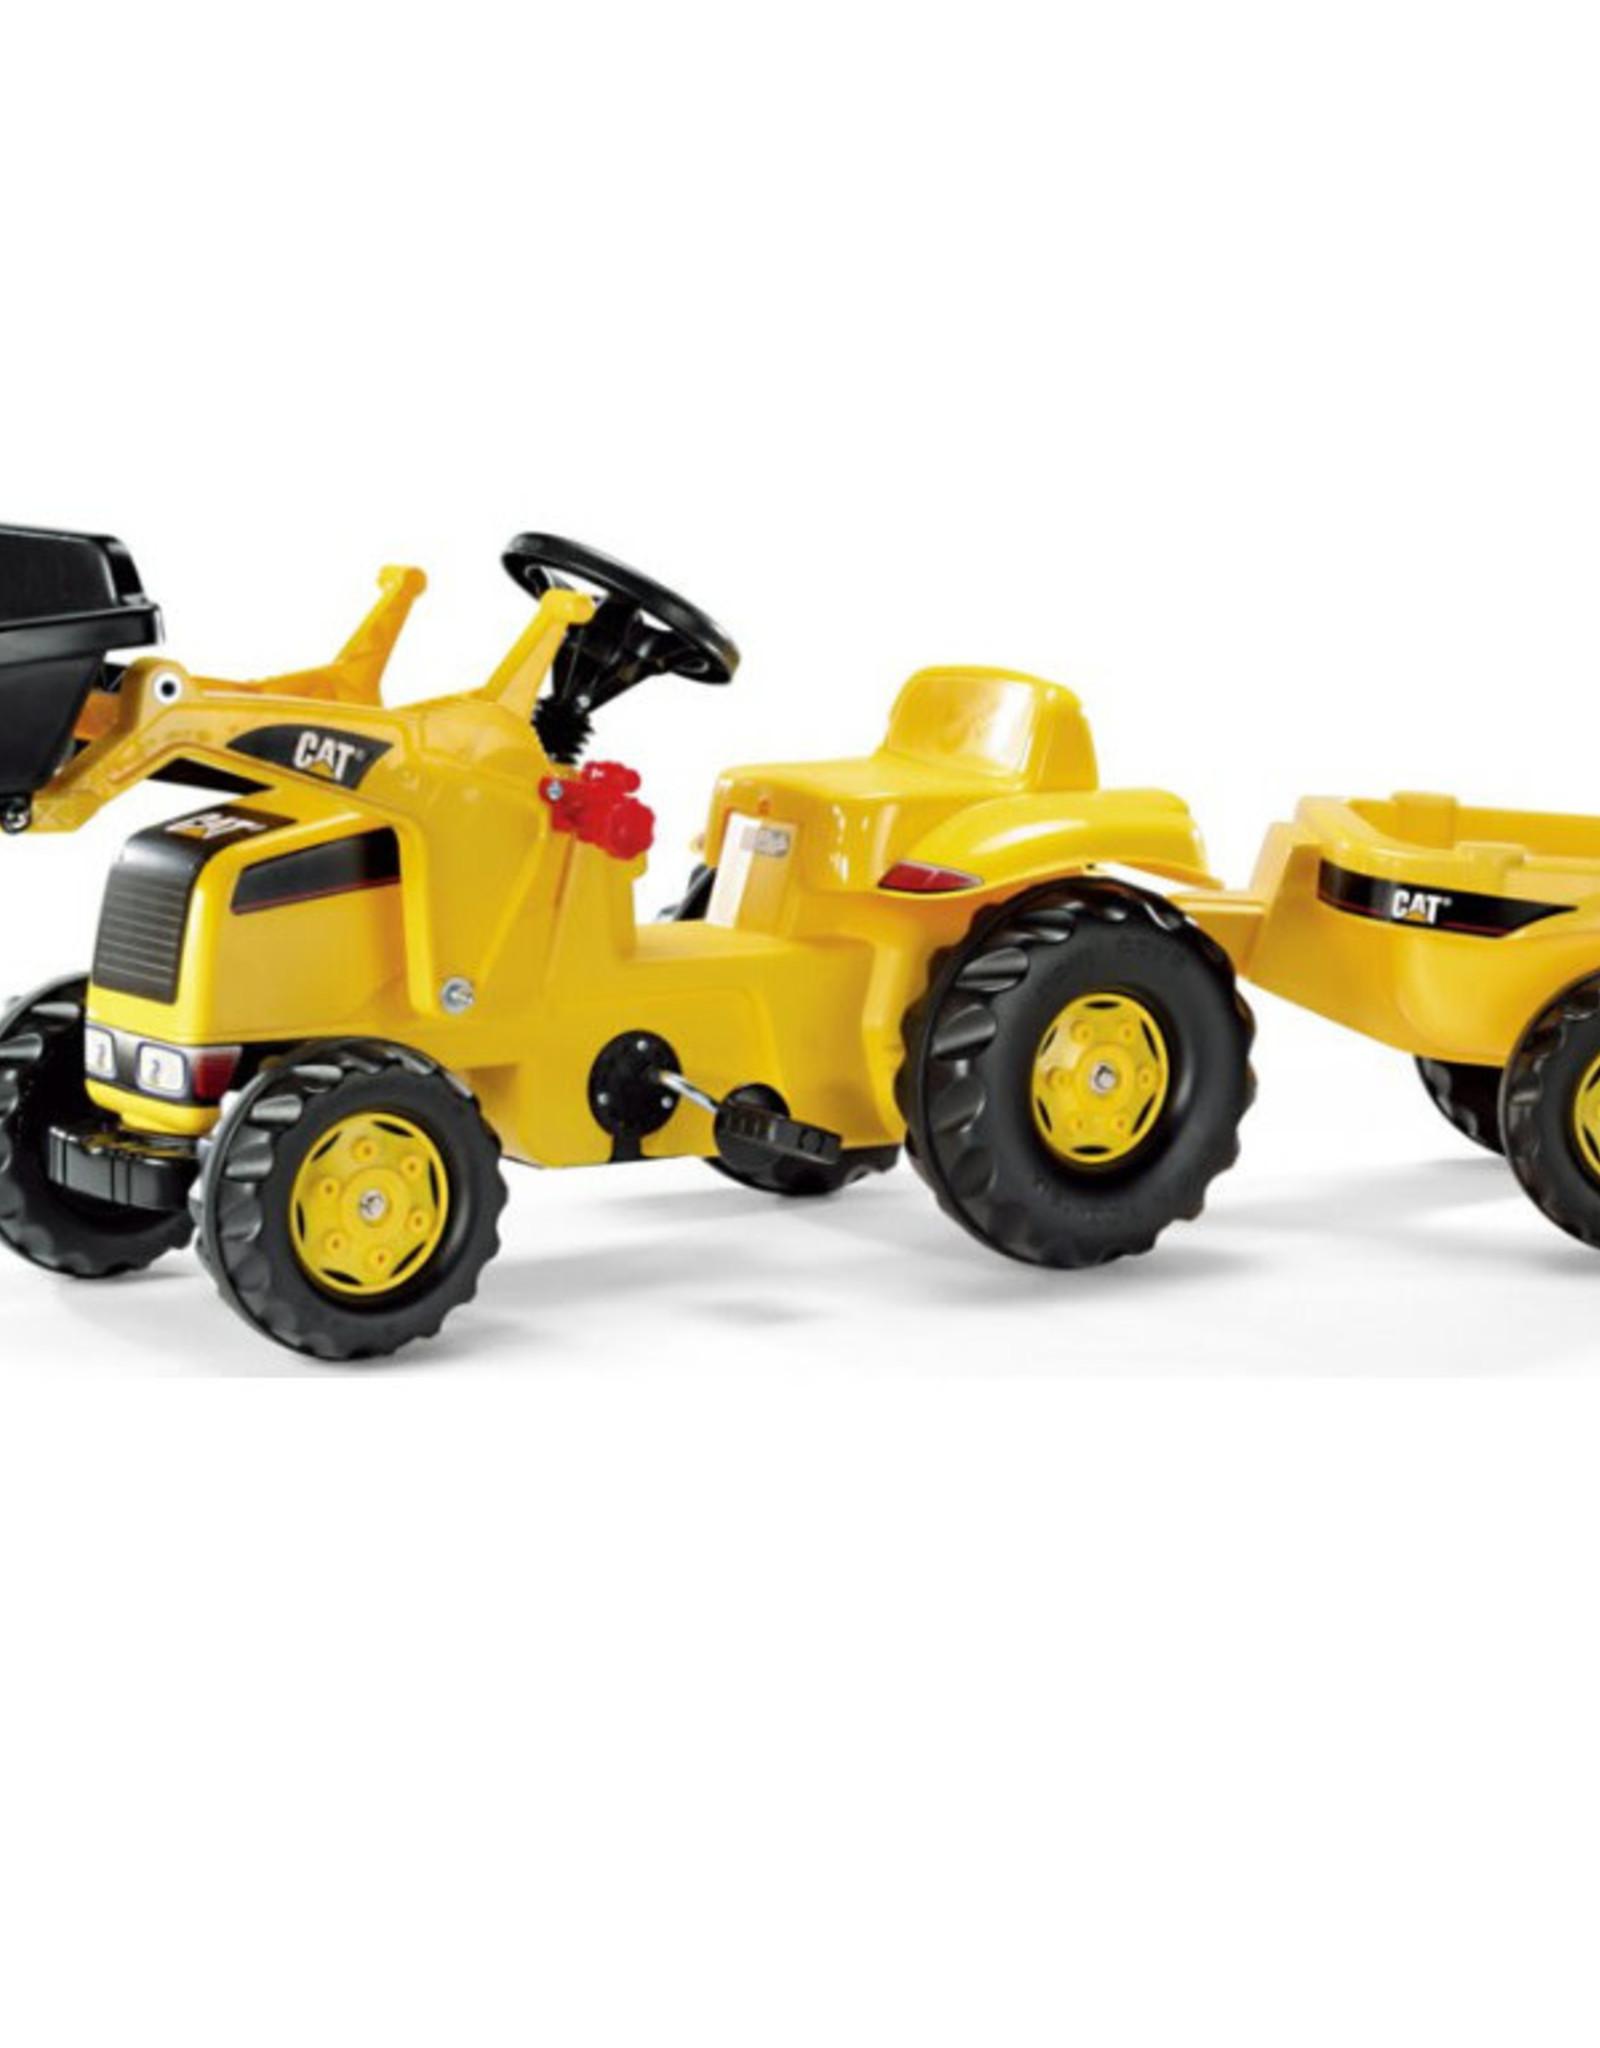 Rody CAT Kid Tractor w/Trailer